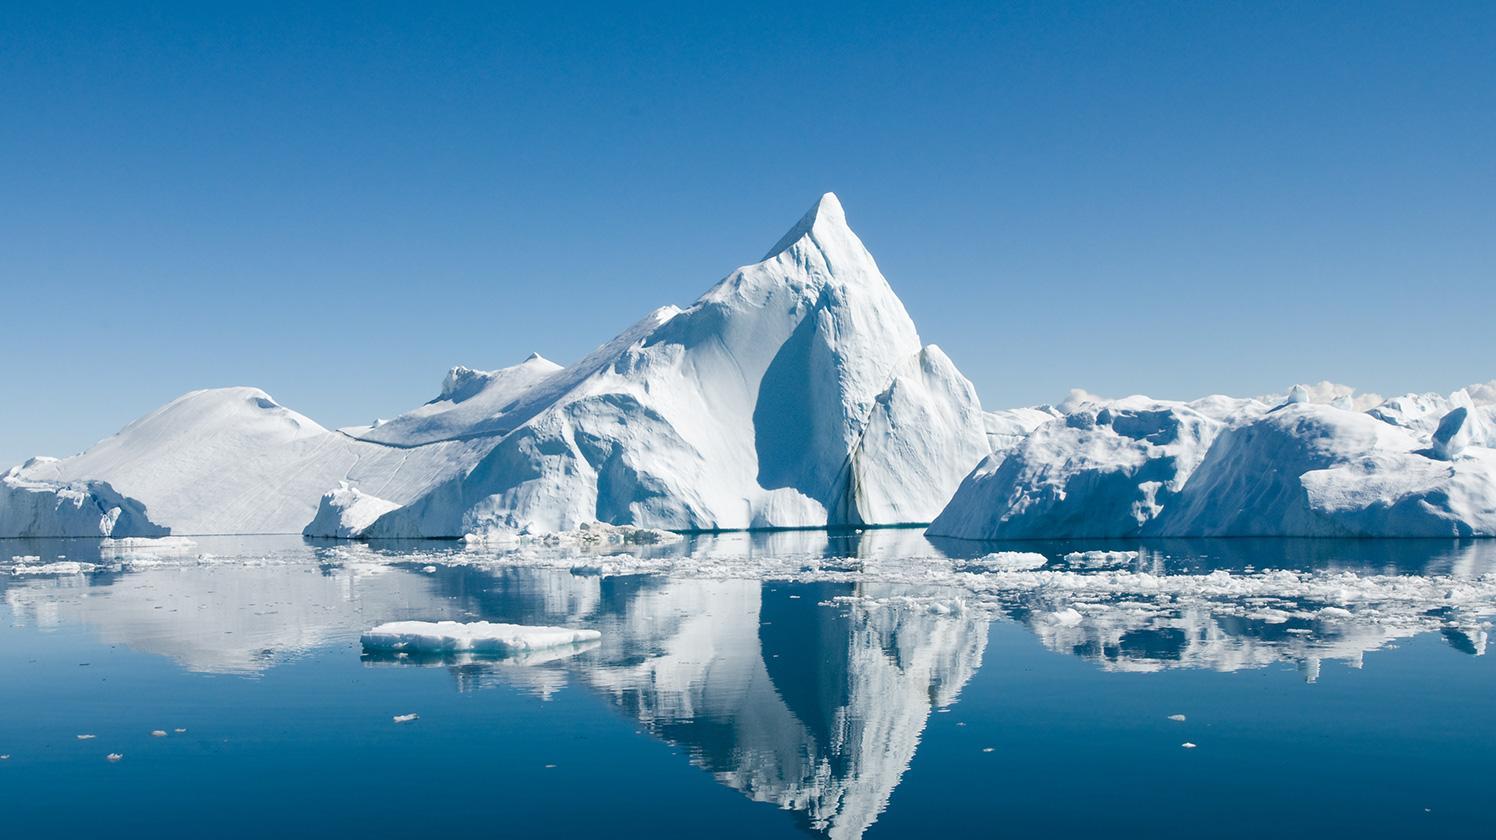 BRITA planète plus saine iceberg flottant